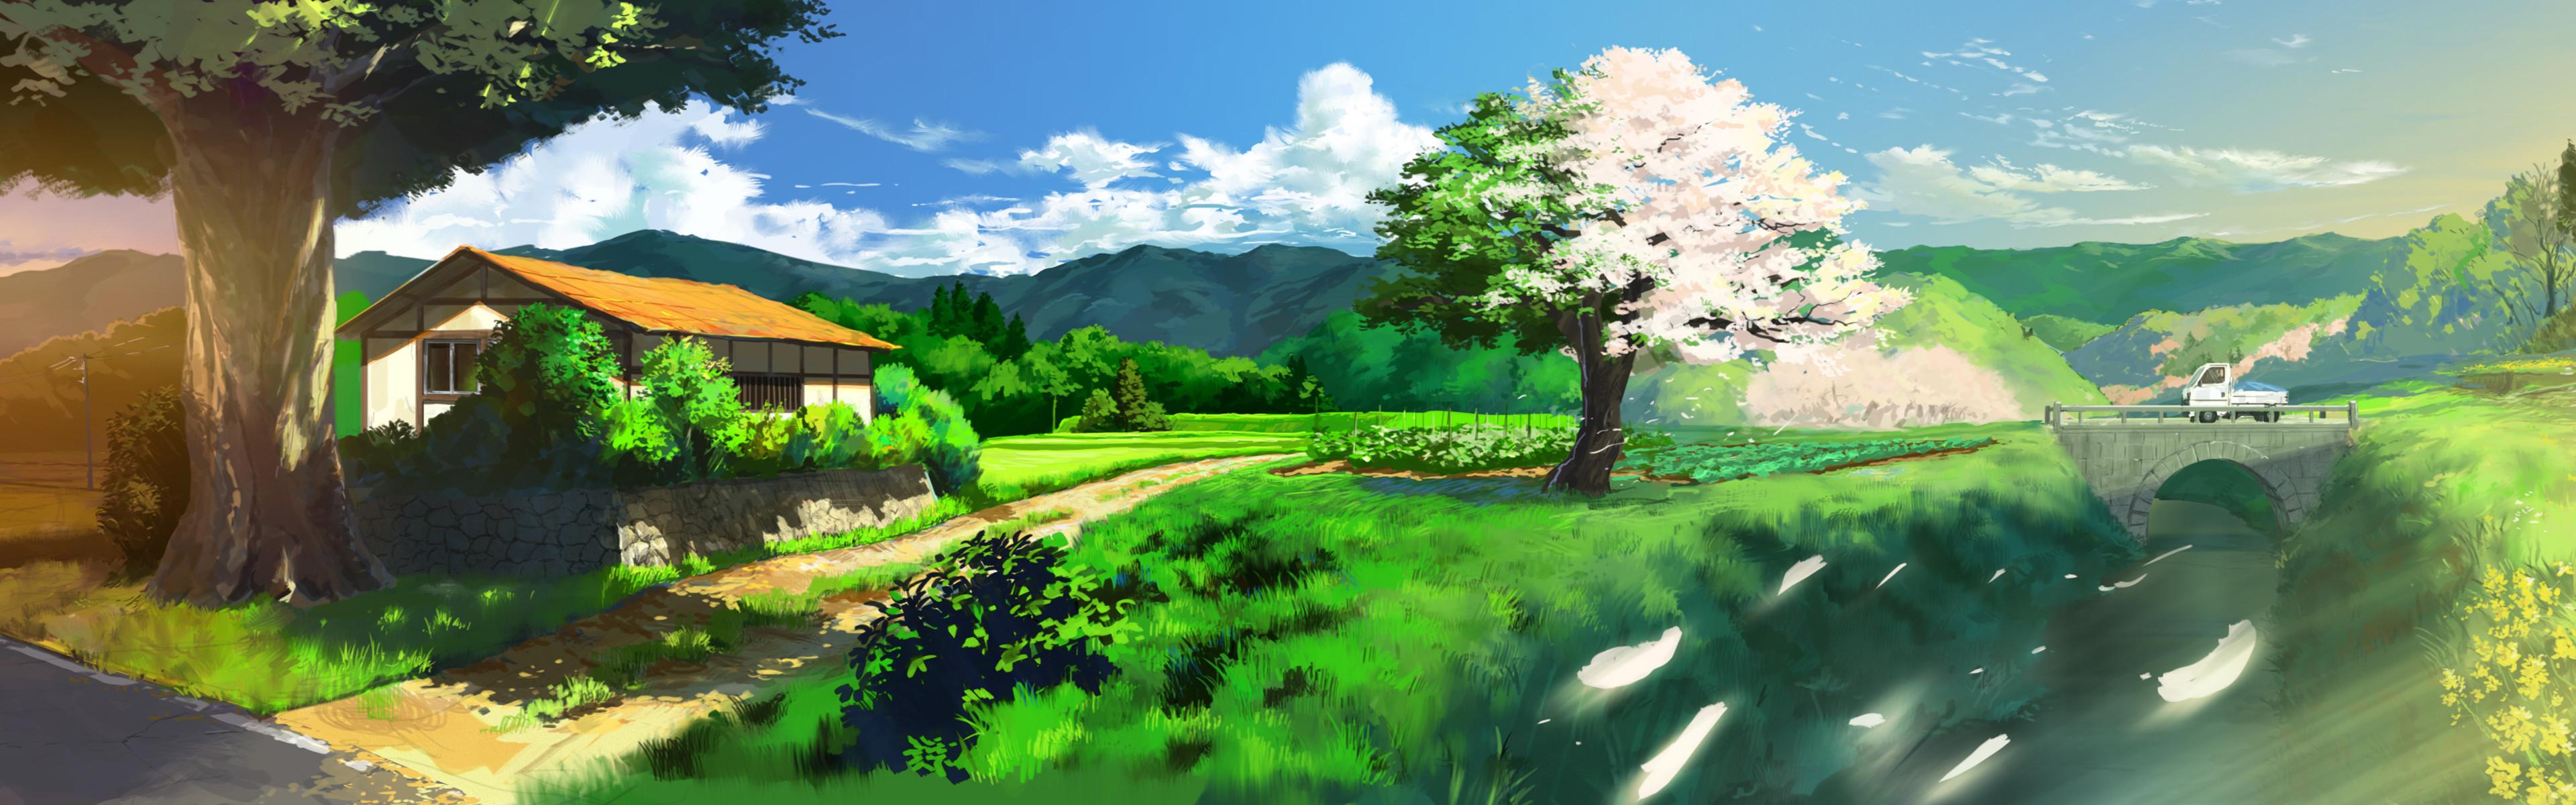 wallpaper.wiki-Screen-Anime-Dual-Monitor-PIC-WPC0012413